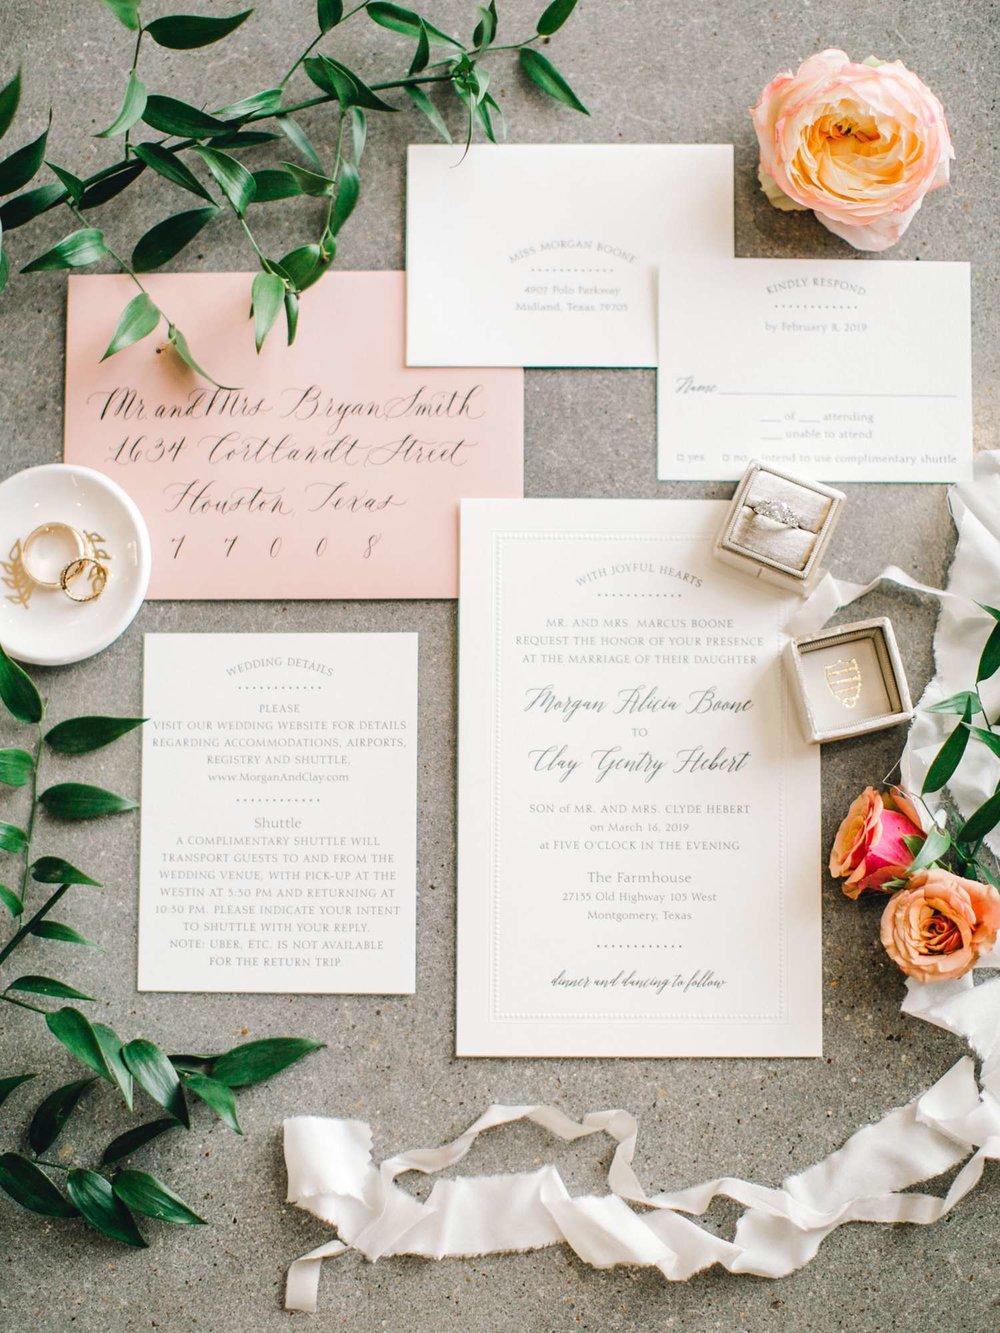 HEBERT_MORGAN_AND_CLAY_ALLEEJ_THE_FARMHOUSE_MONTGOMERY_TEXAS_WEDDING_0001.jpg